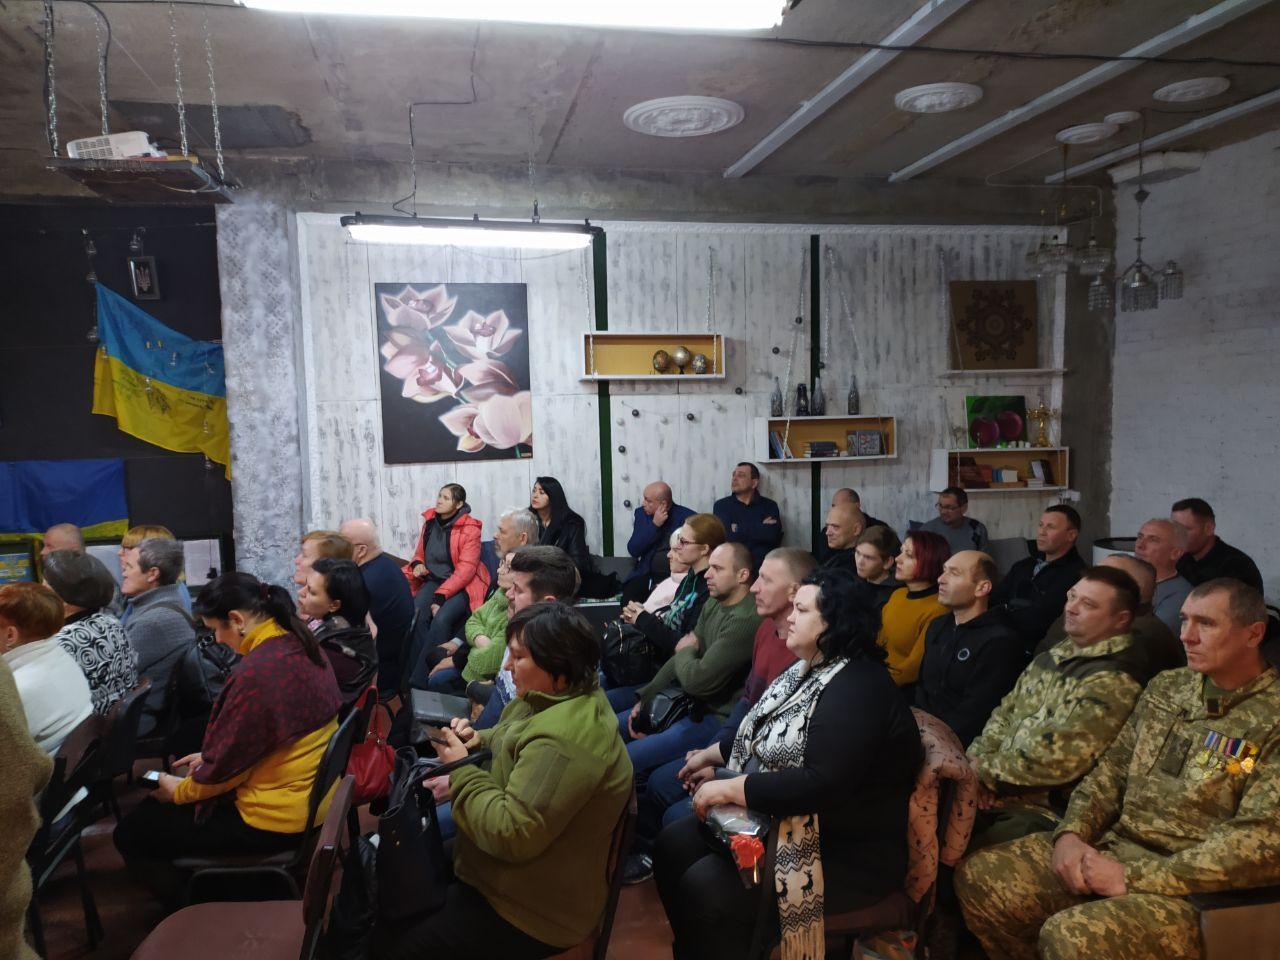 У Кропивницькому вшанували пам'ять Володимира Степанка та згадали Бої за Дебальцеве (ФОТО)